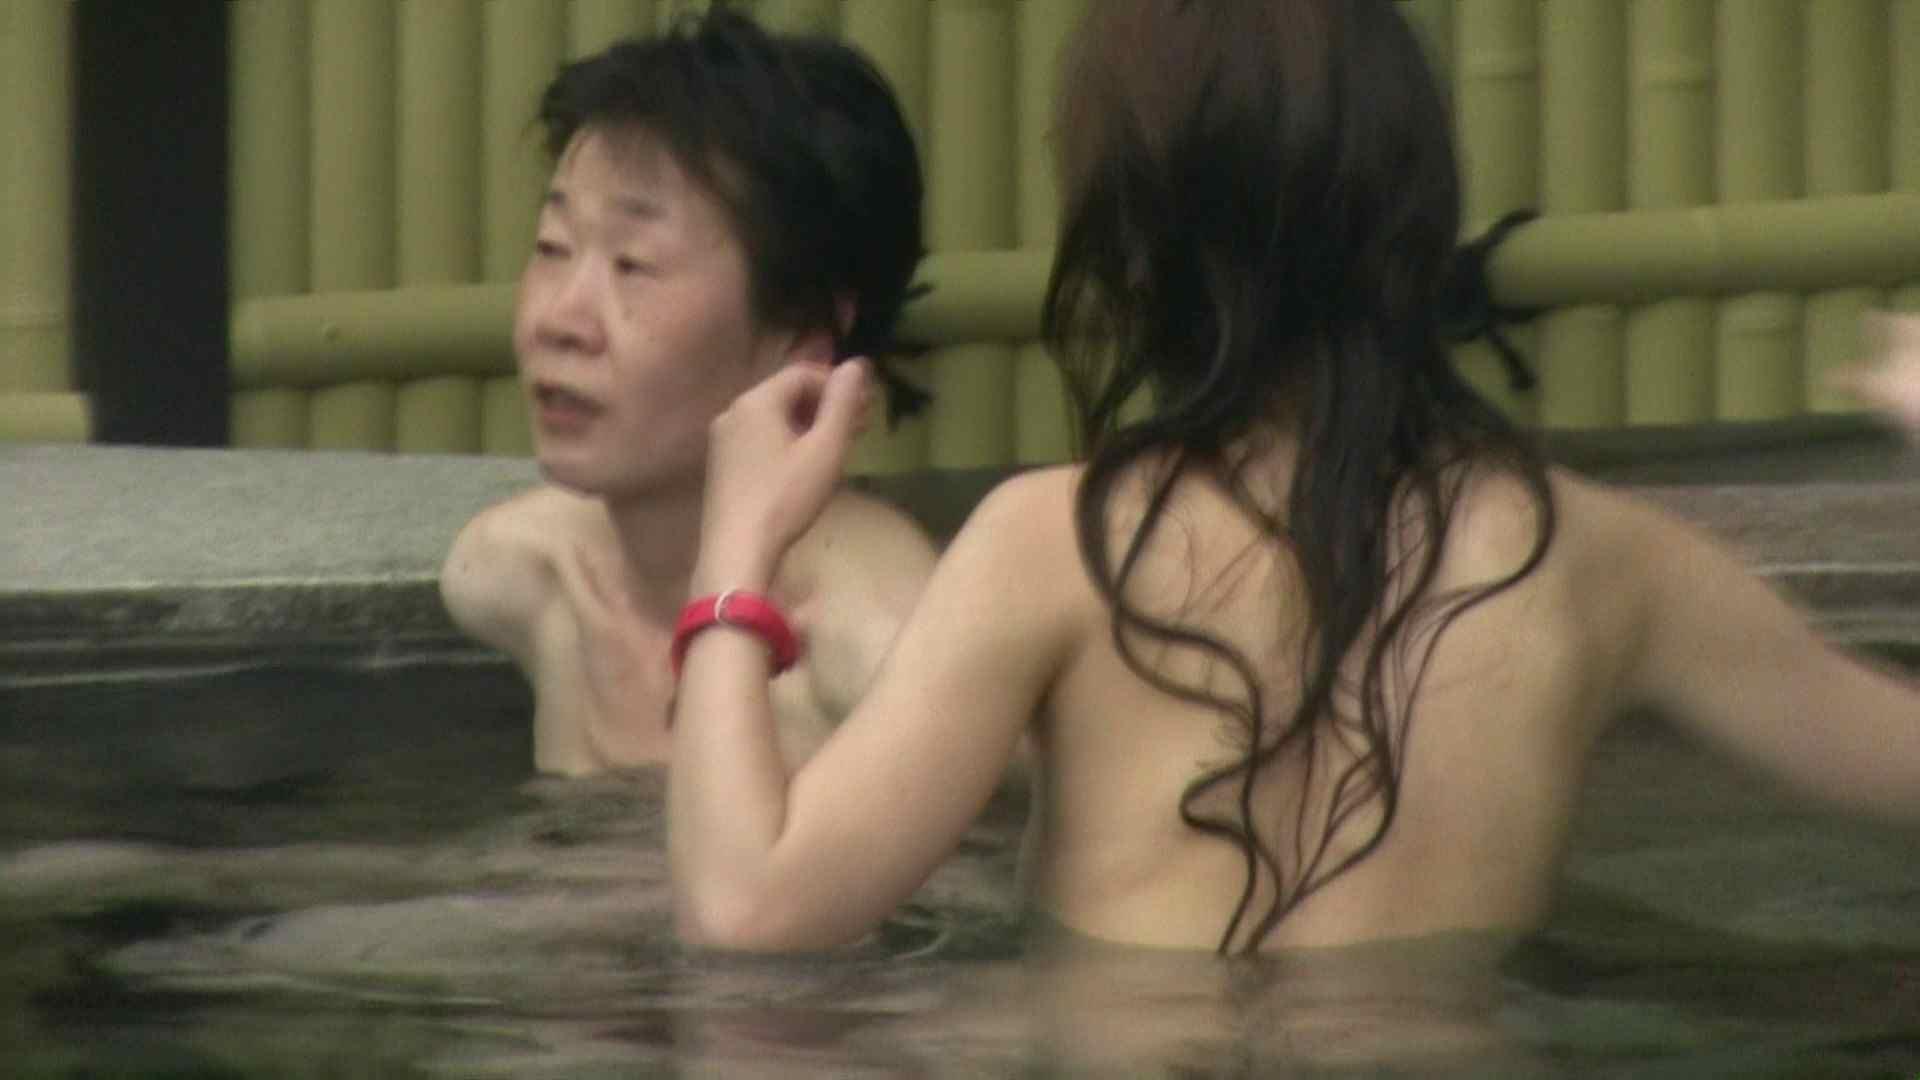 Aquaな露天風呂Vol.07 露天風呂 エロ無料画像 111連発 17